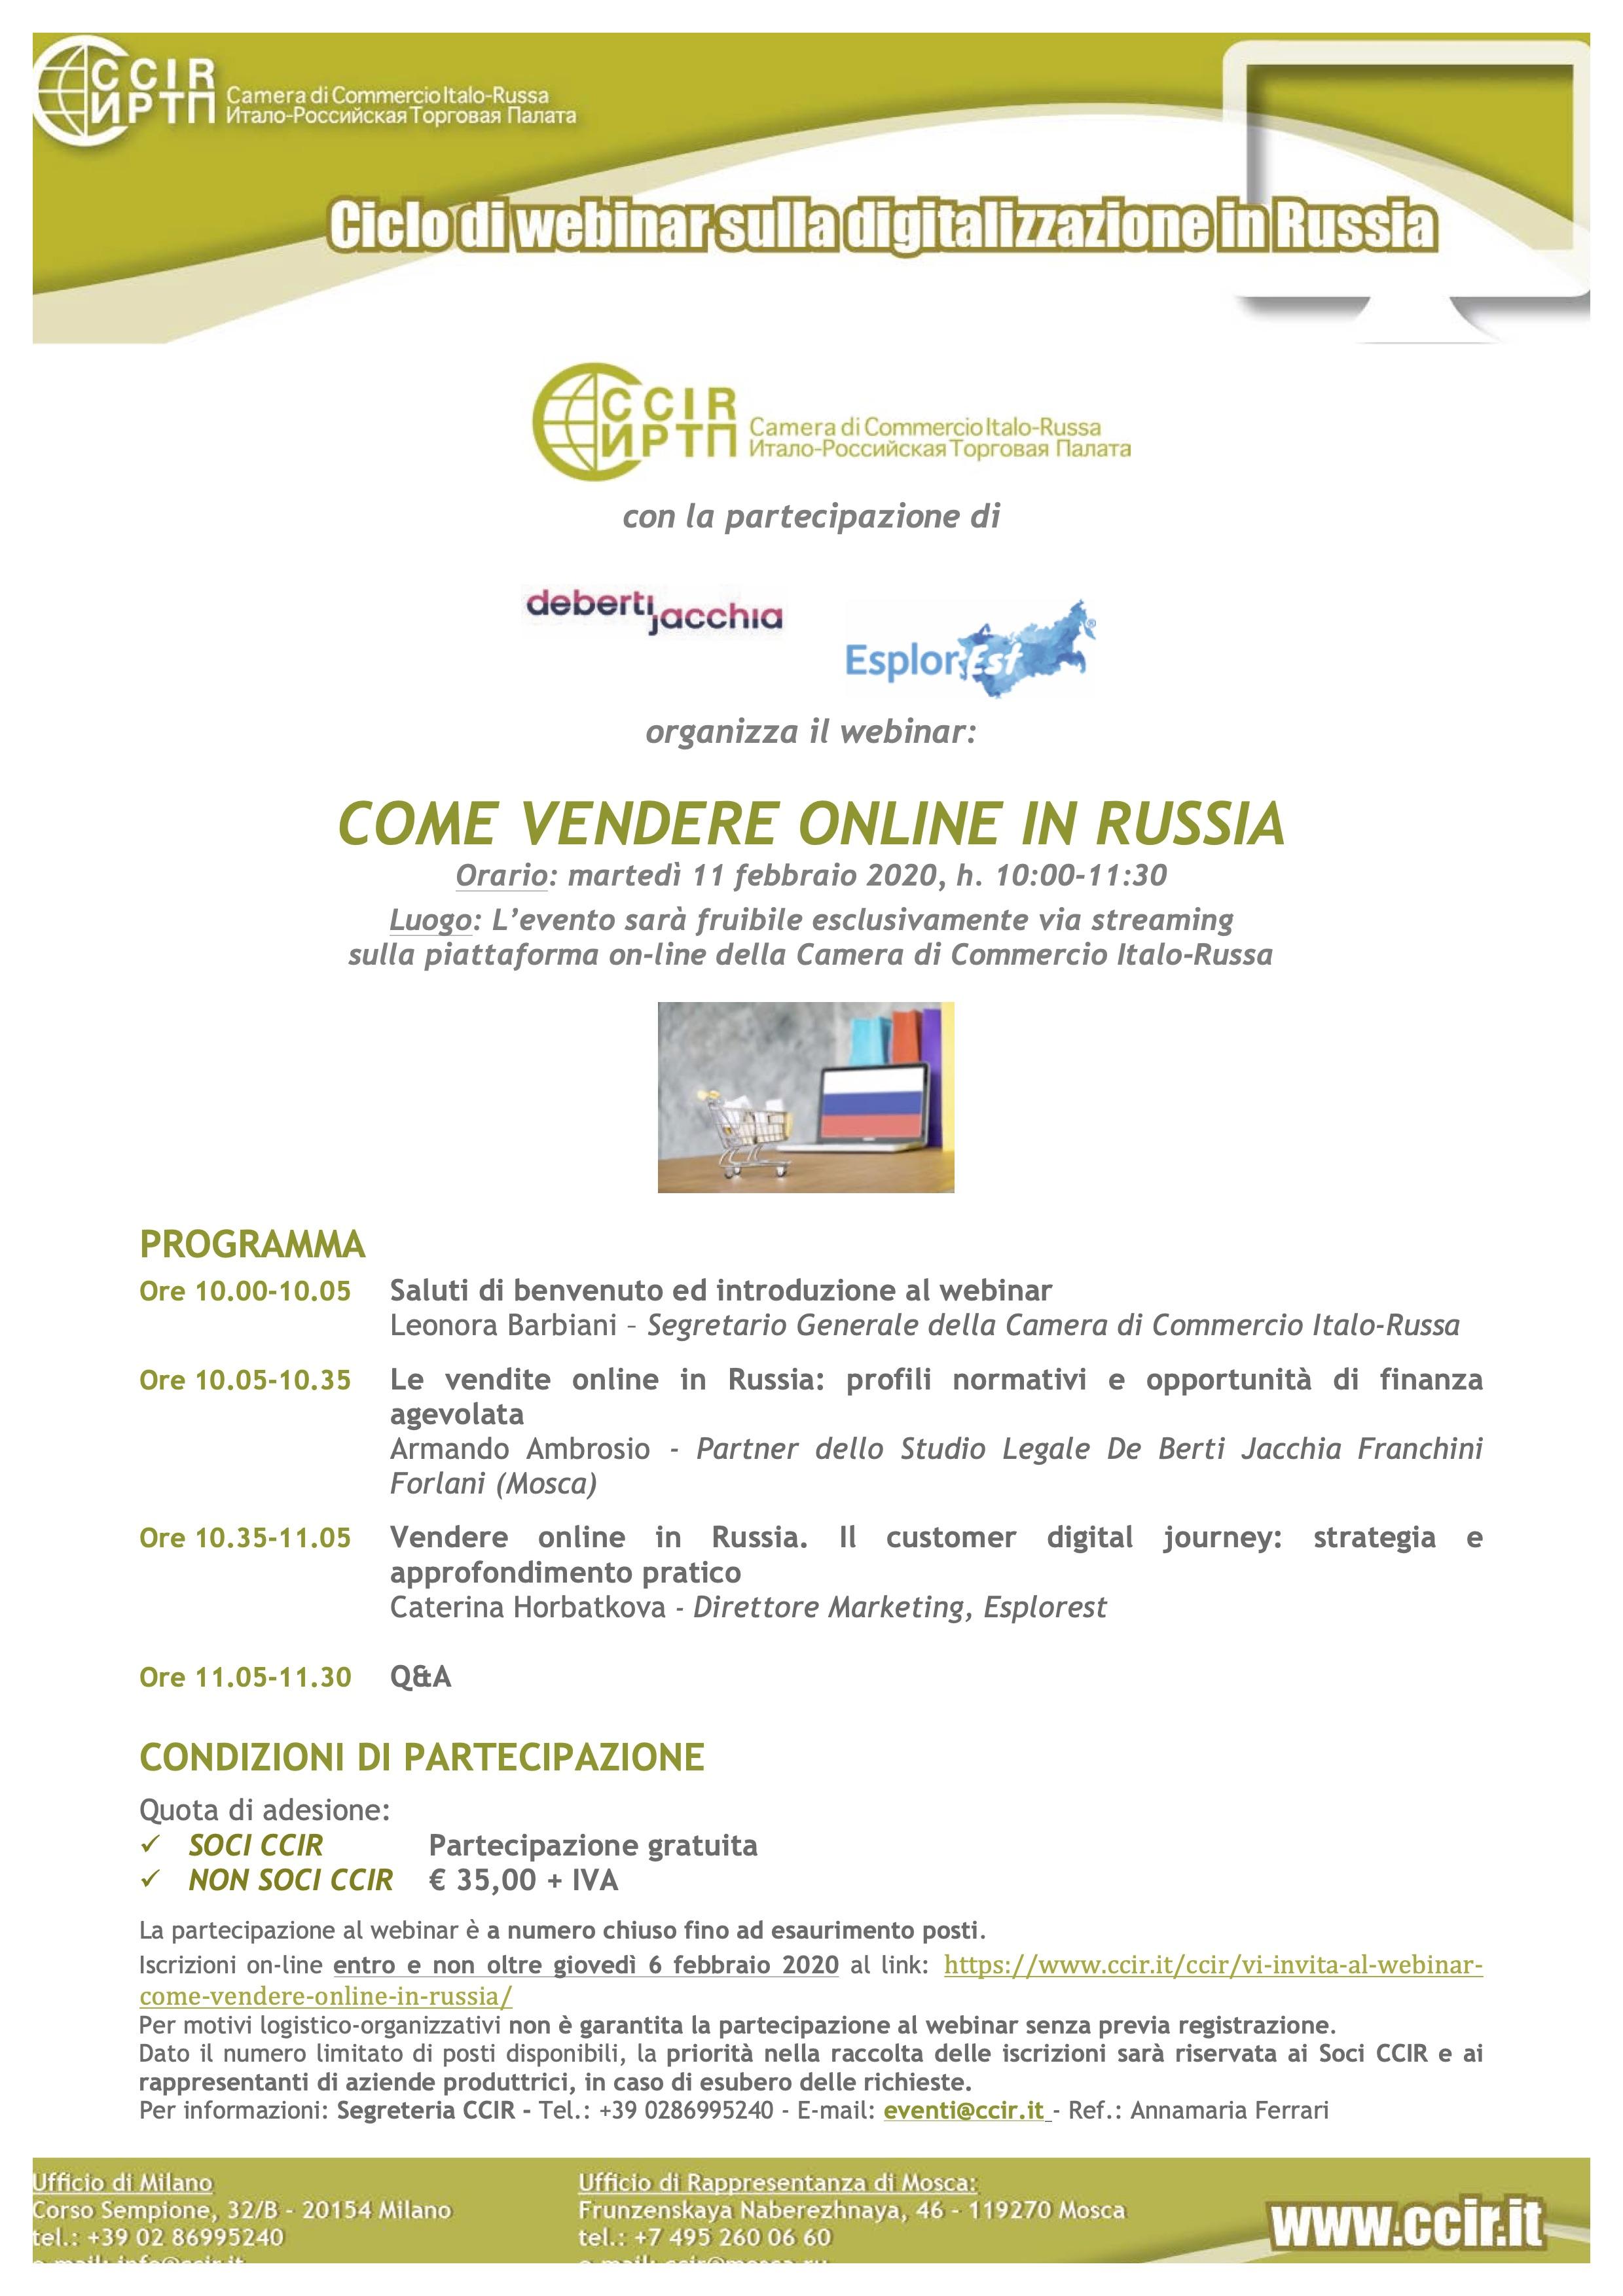 COME VENDERE ONLINE IN RUSSIA - webinar, February 11th ...